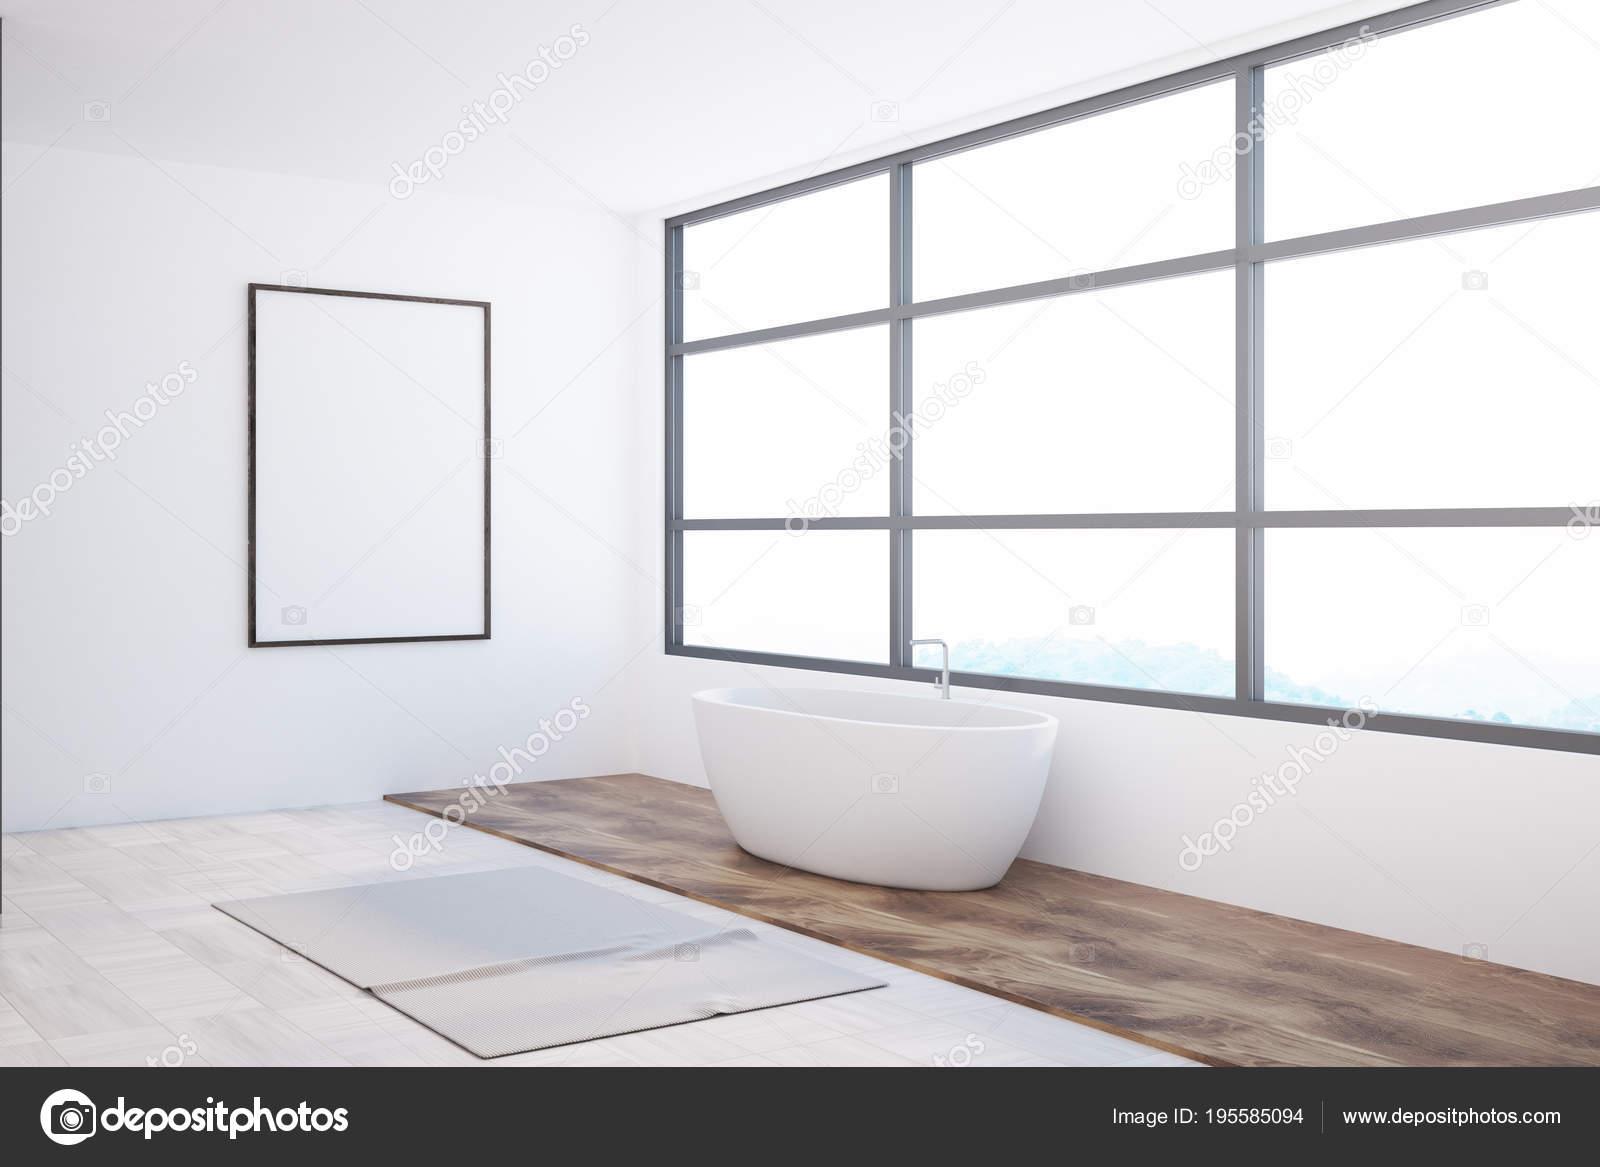 Houten Vloer Badkamer : Houten vloer badkamer aziatische stijl poster u2014 stockfoto